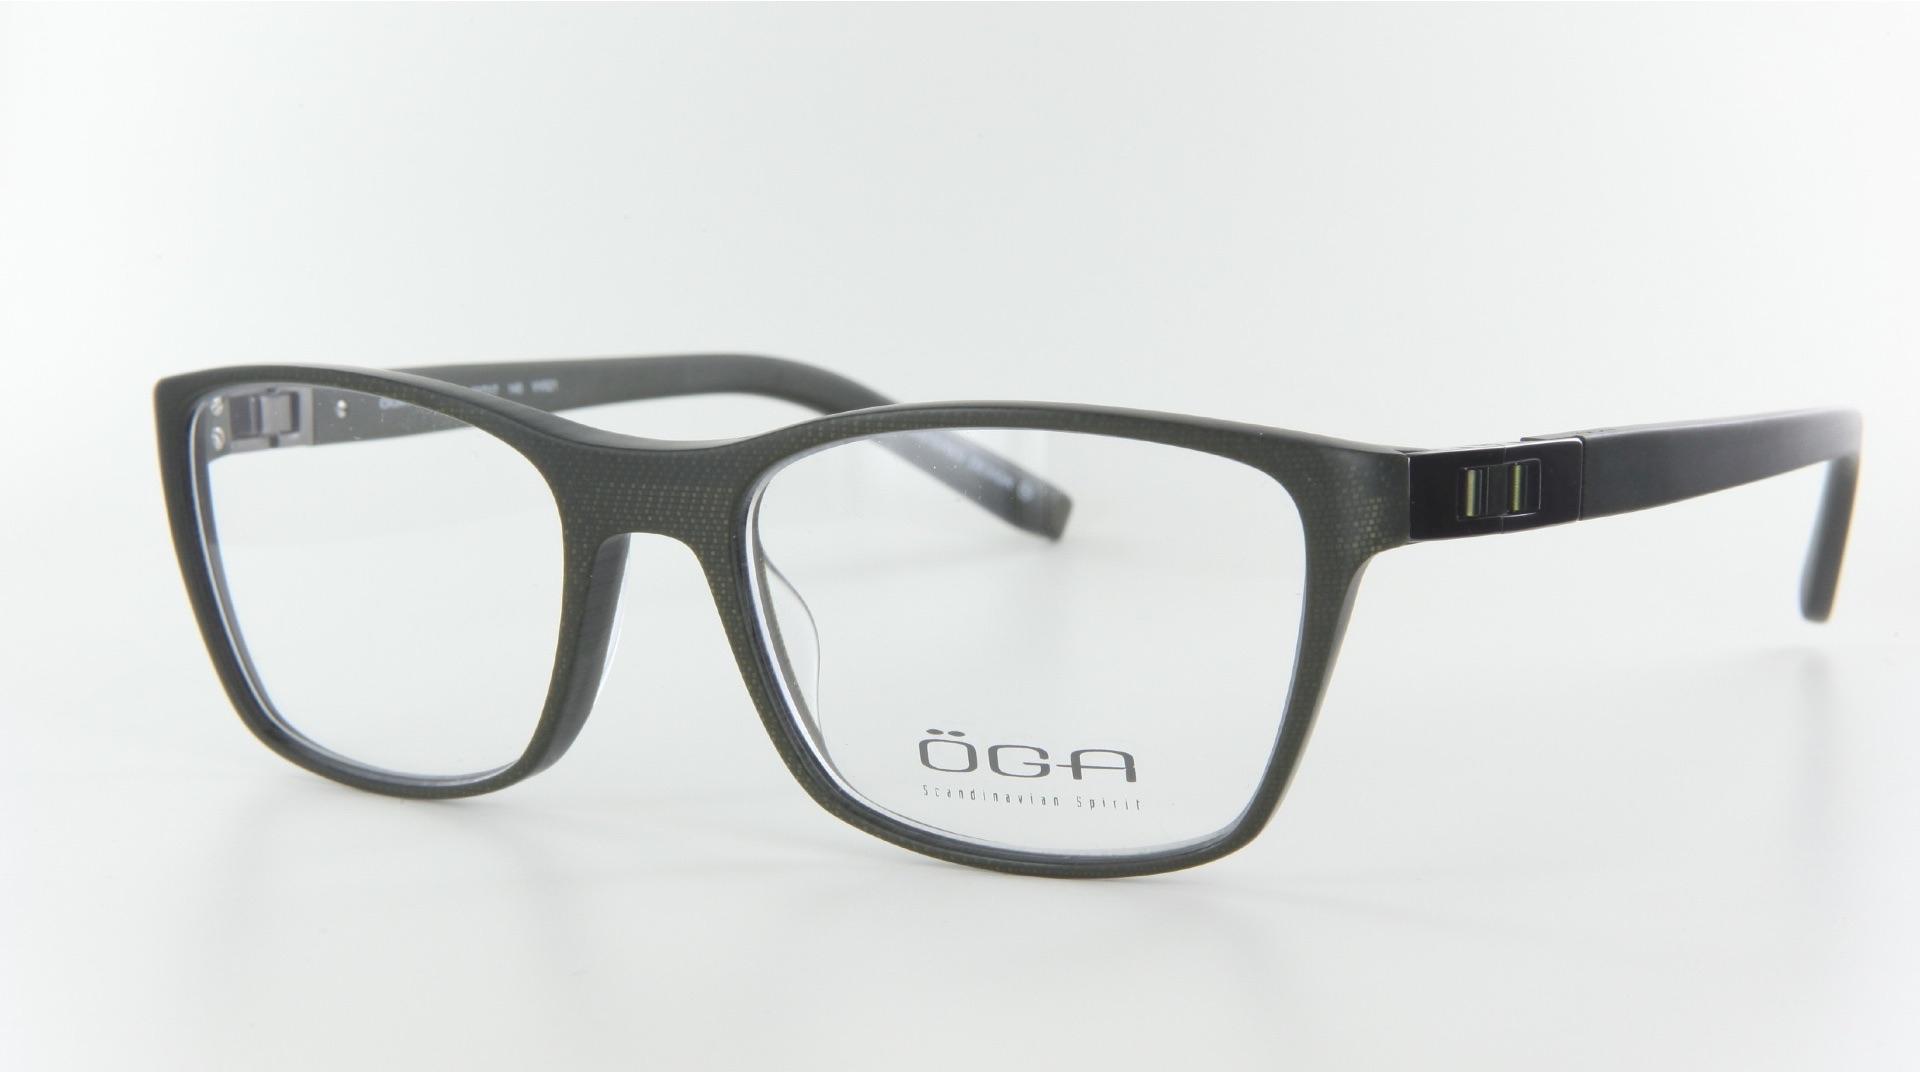 OGA - ref: 70579